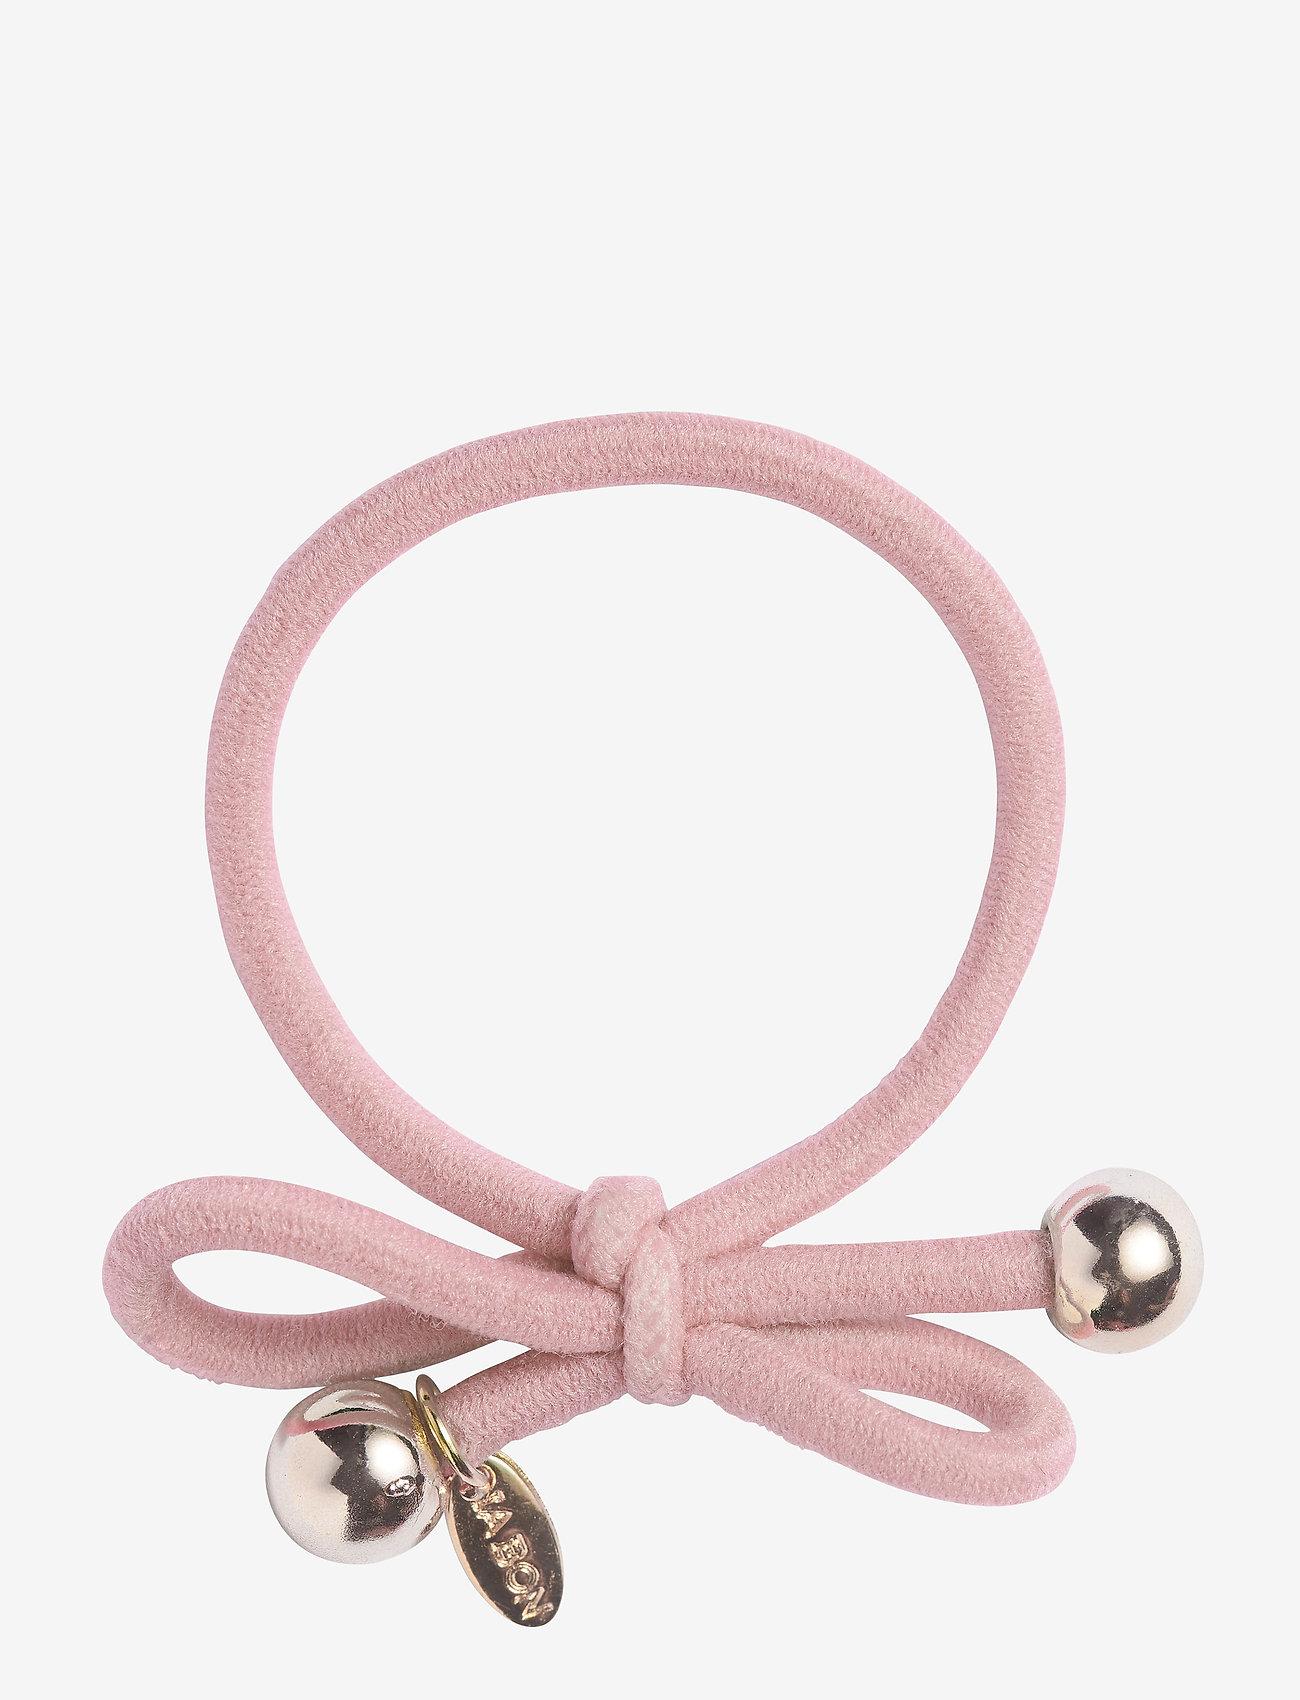 Ia Bon - HAIR TIE WITH GOLD BEAD - POWDER PINK - hårsnoddar - powder pink - 0